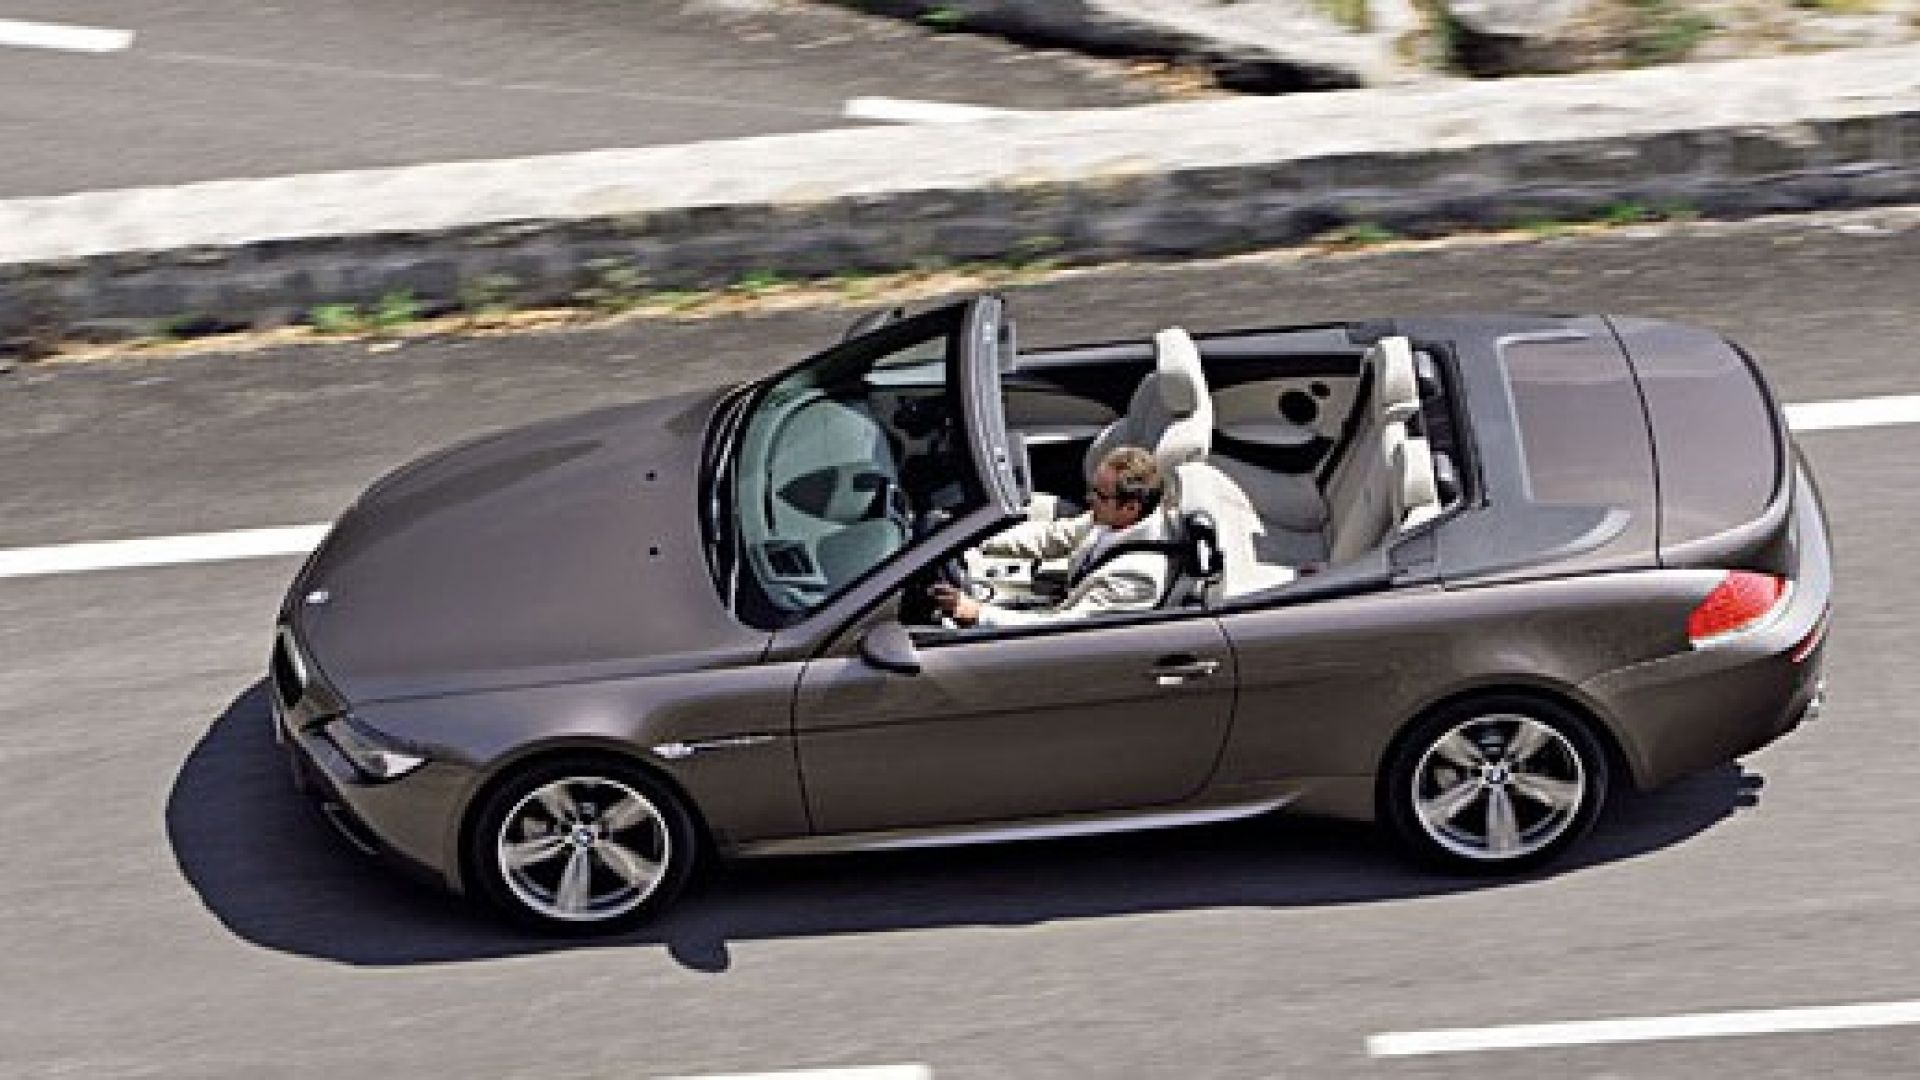 Anteprima Bmw M6 Cabrio Motorbox